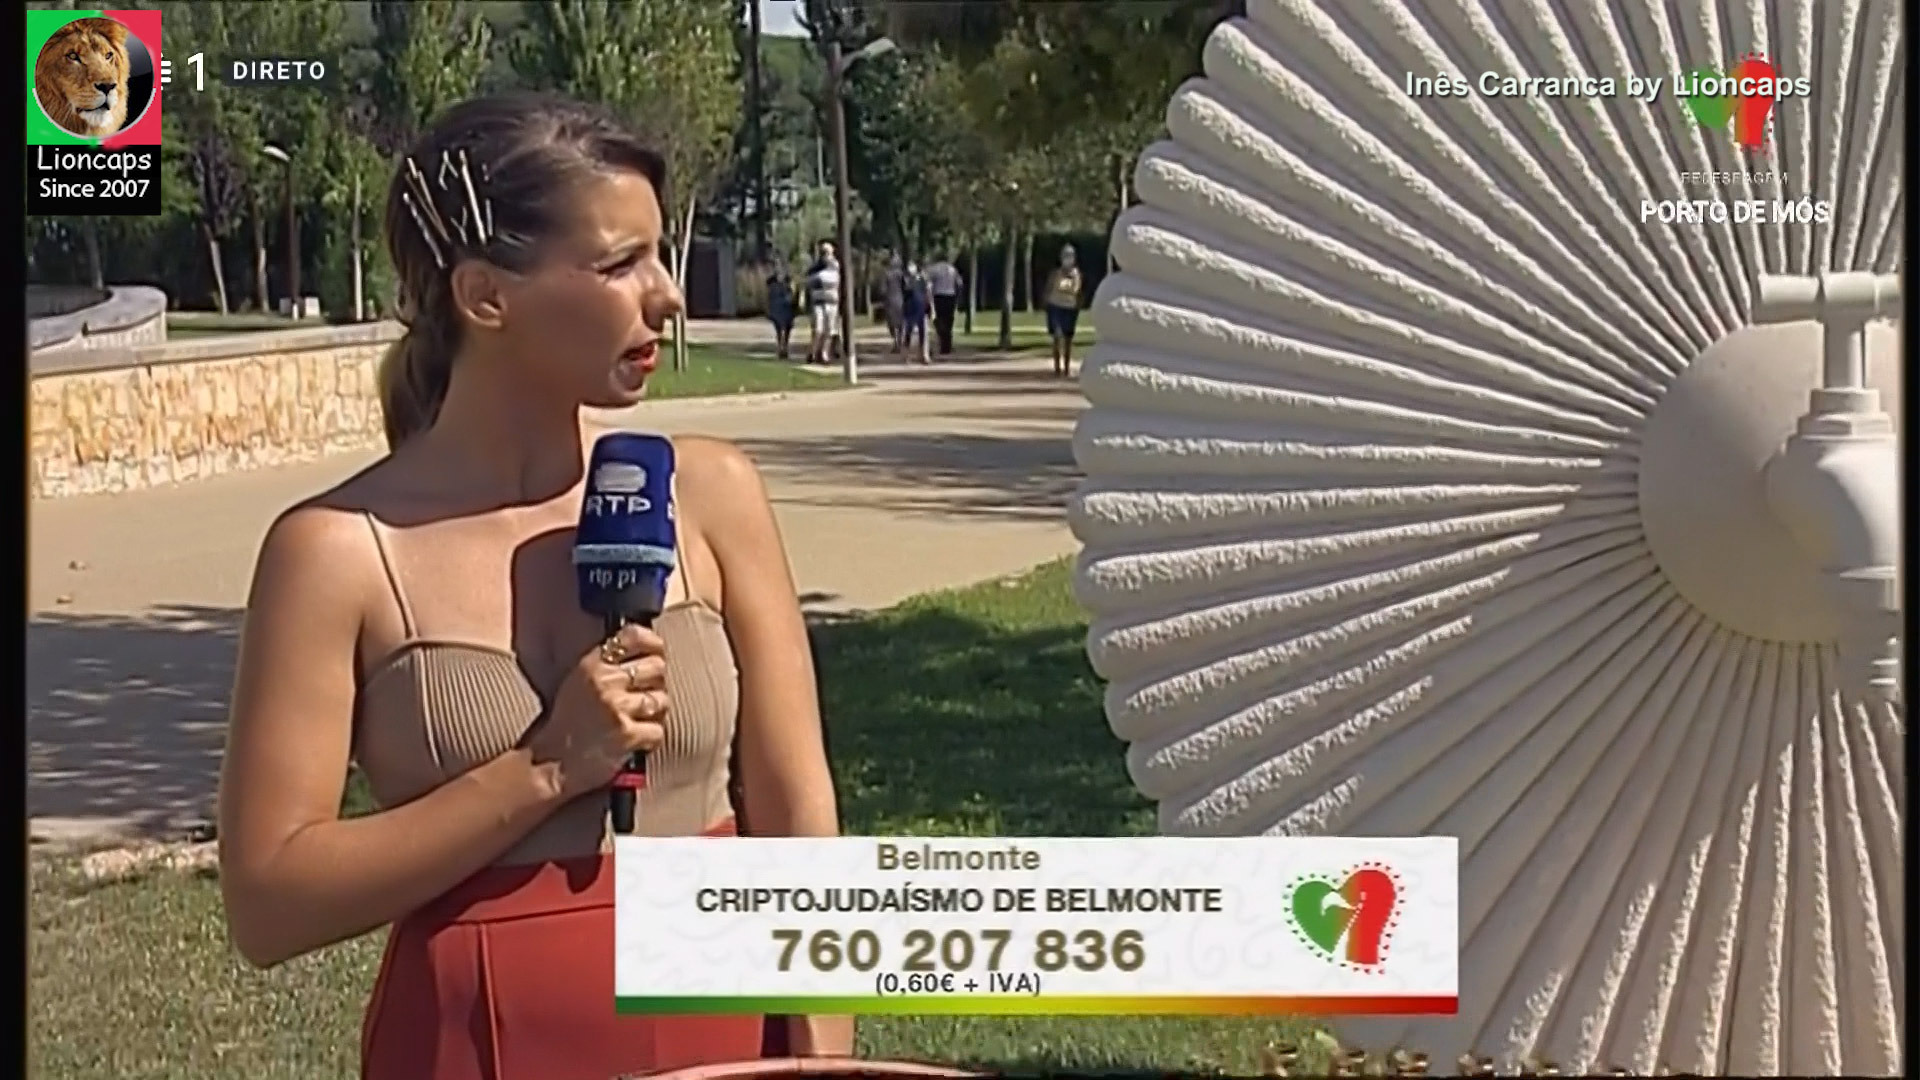 ines_carranca (18).jpg